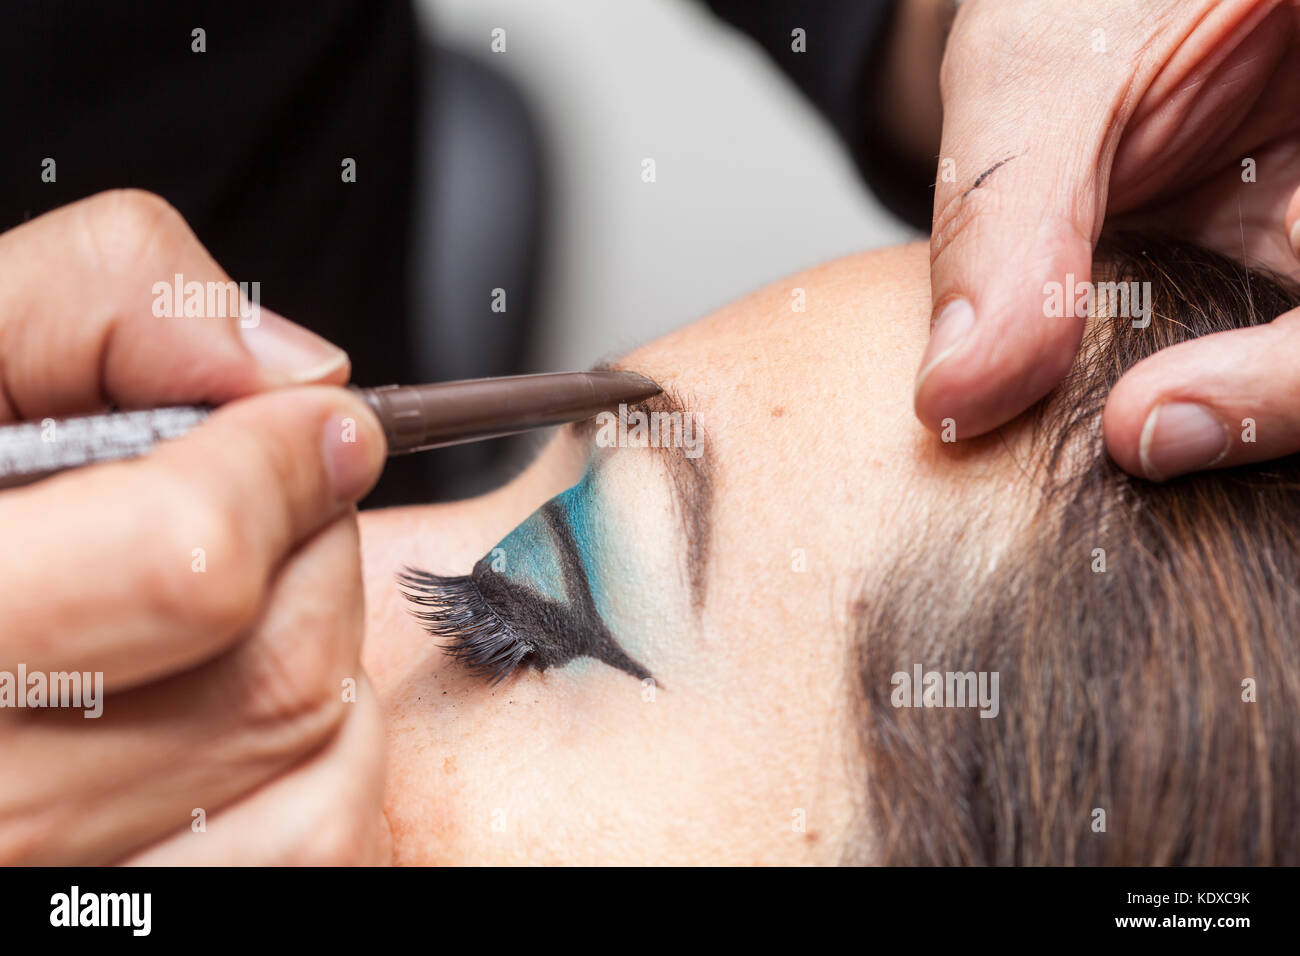 Eyebrows And Salon Stock Photos Eyebrows And Salon Stock Images